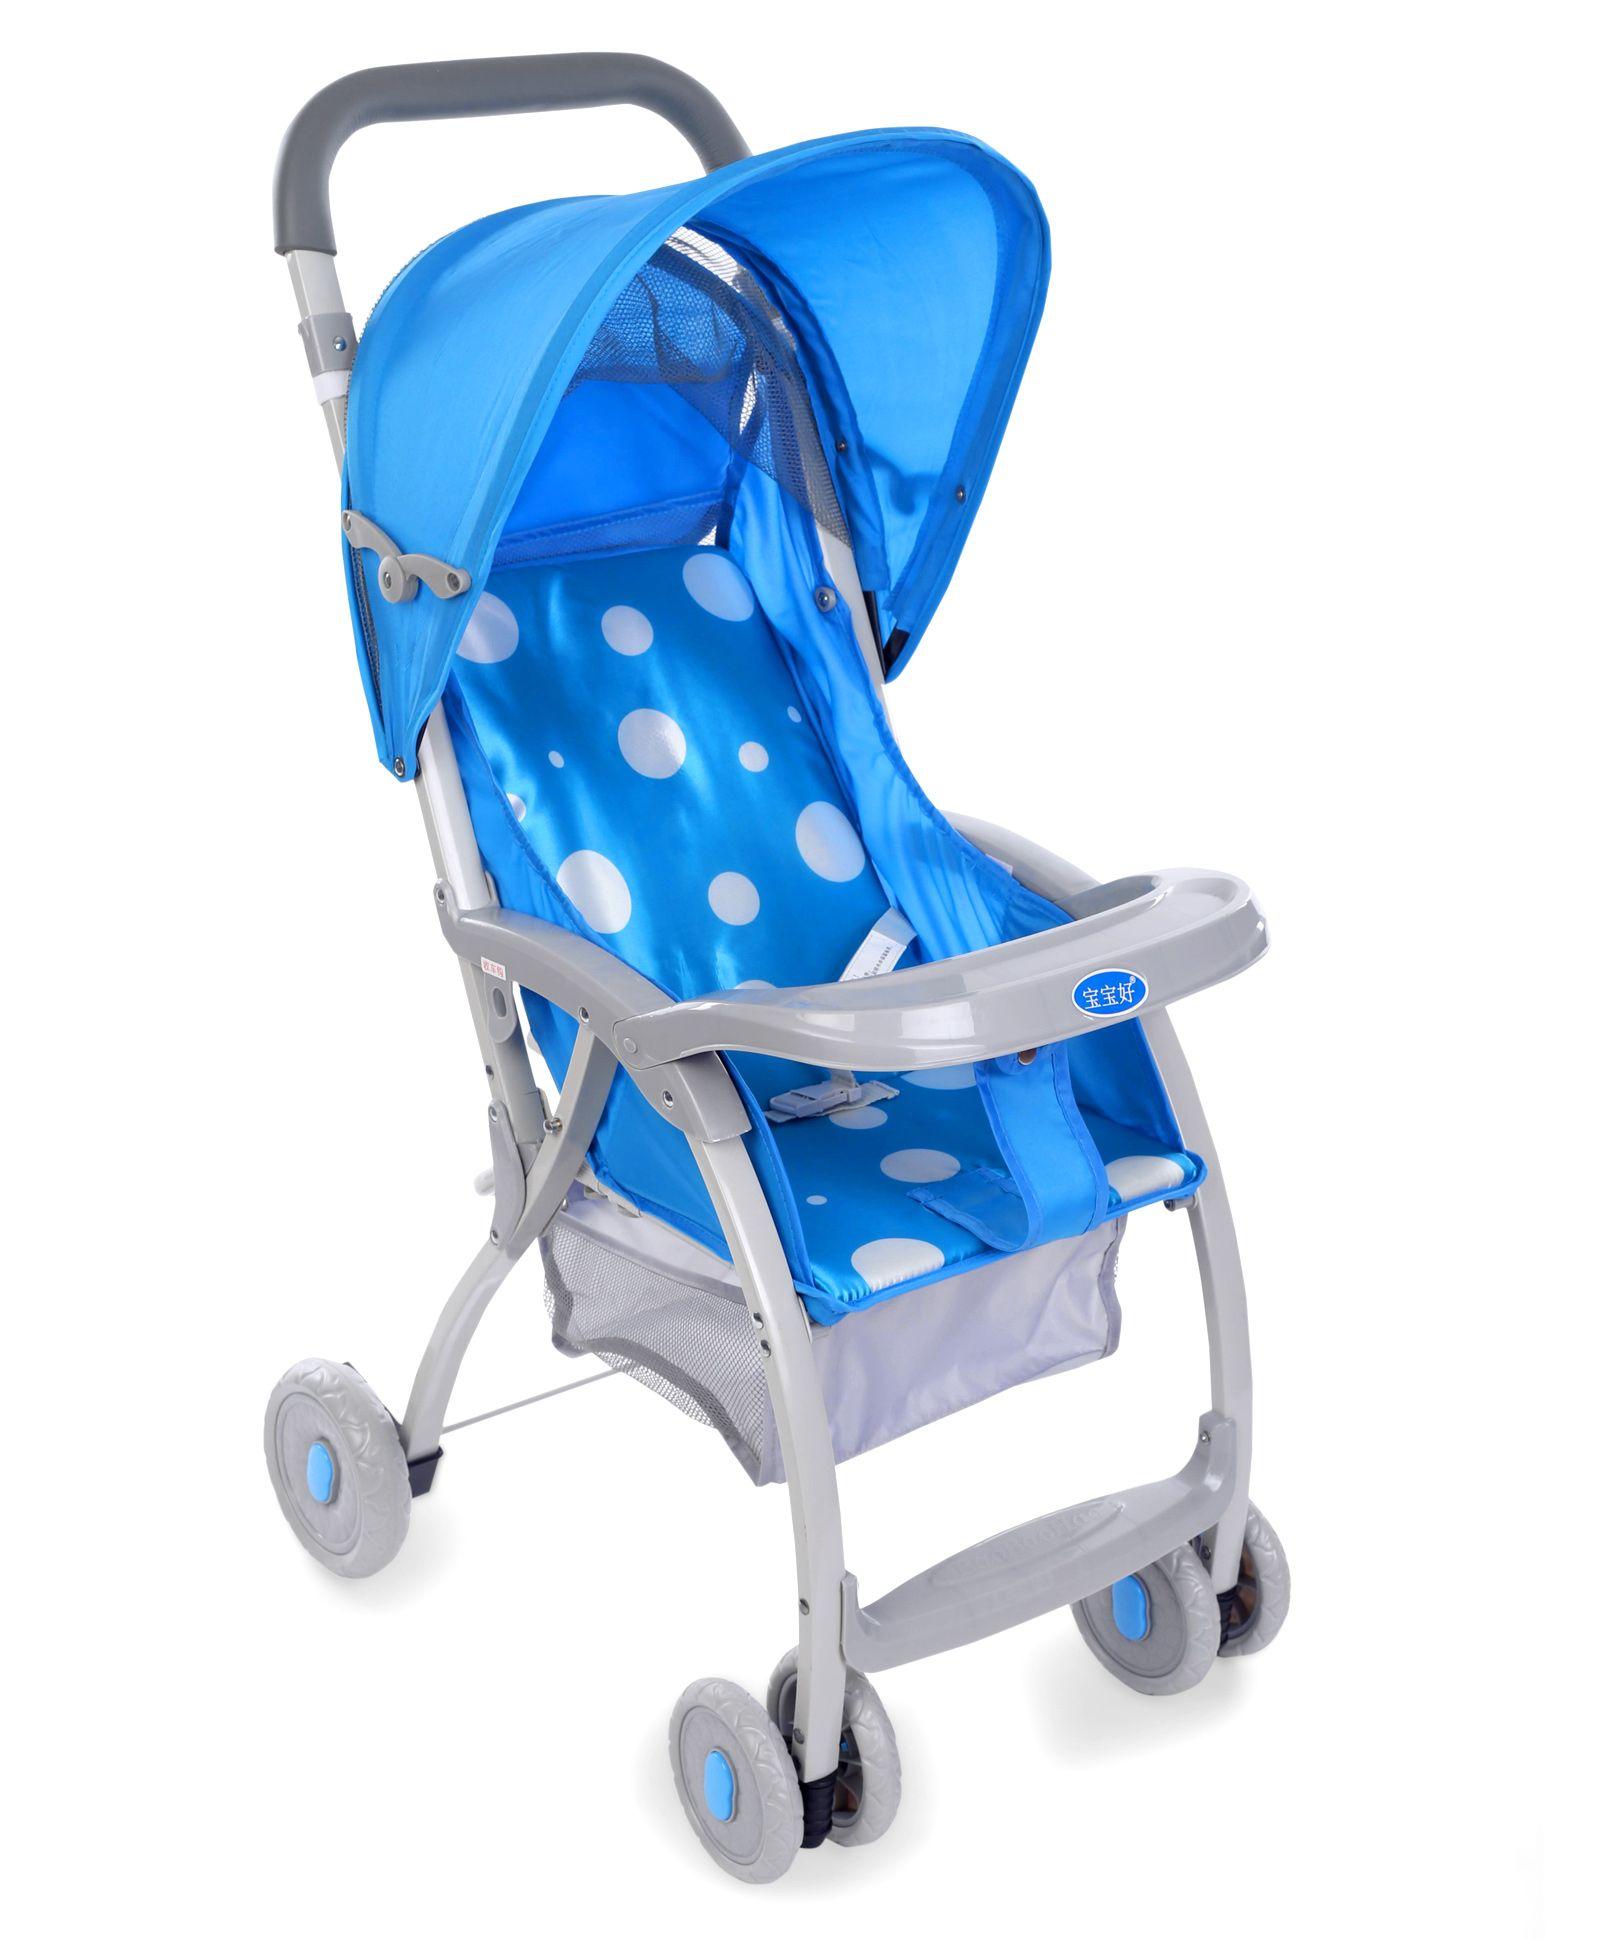 Baby Polka Dot Print Pram Cum Stroller - Blue